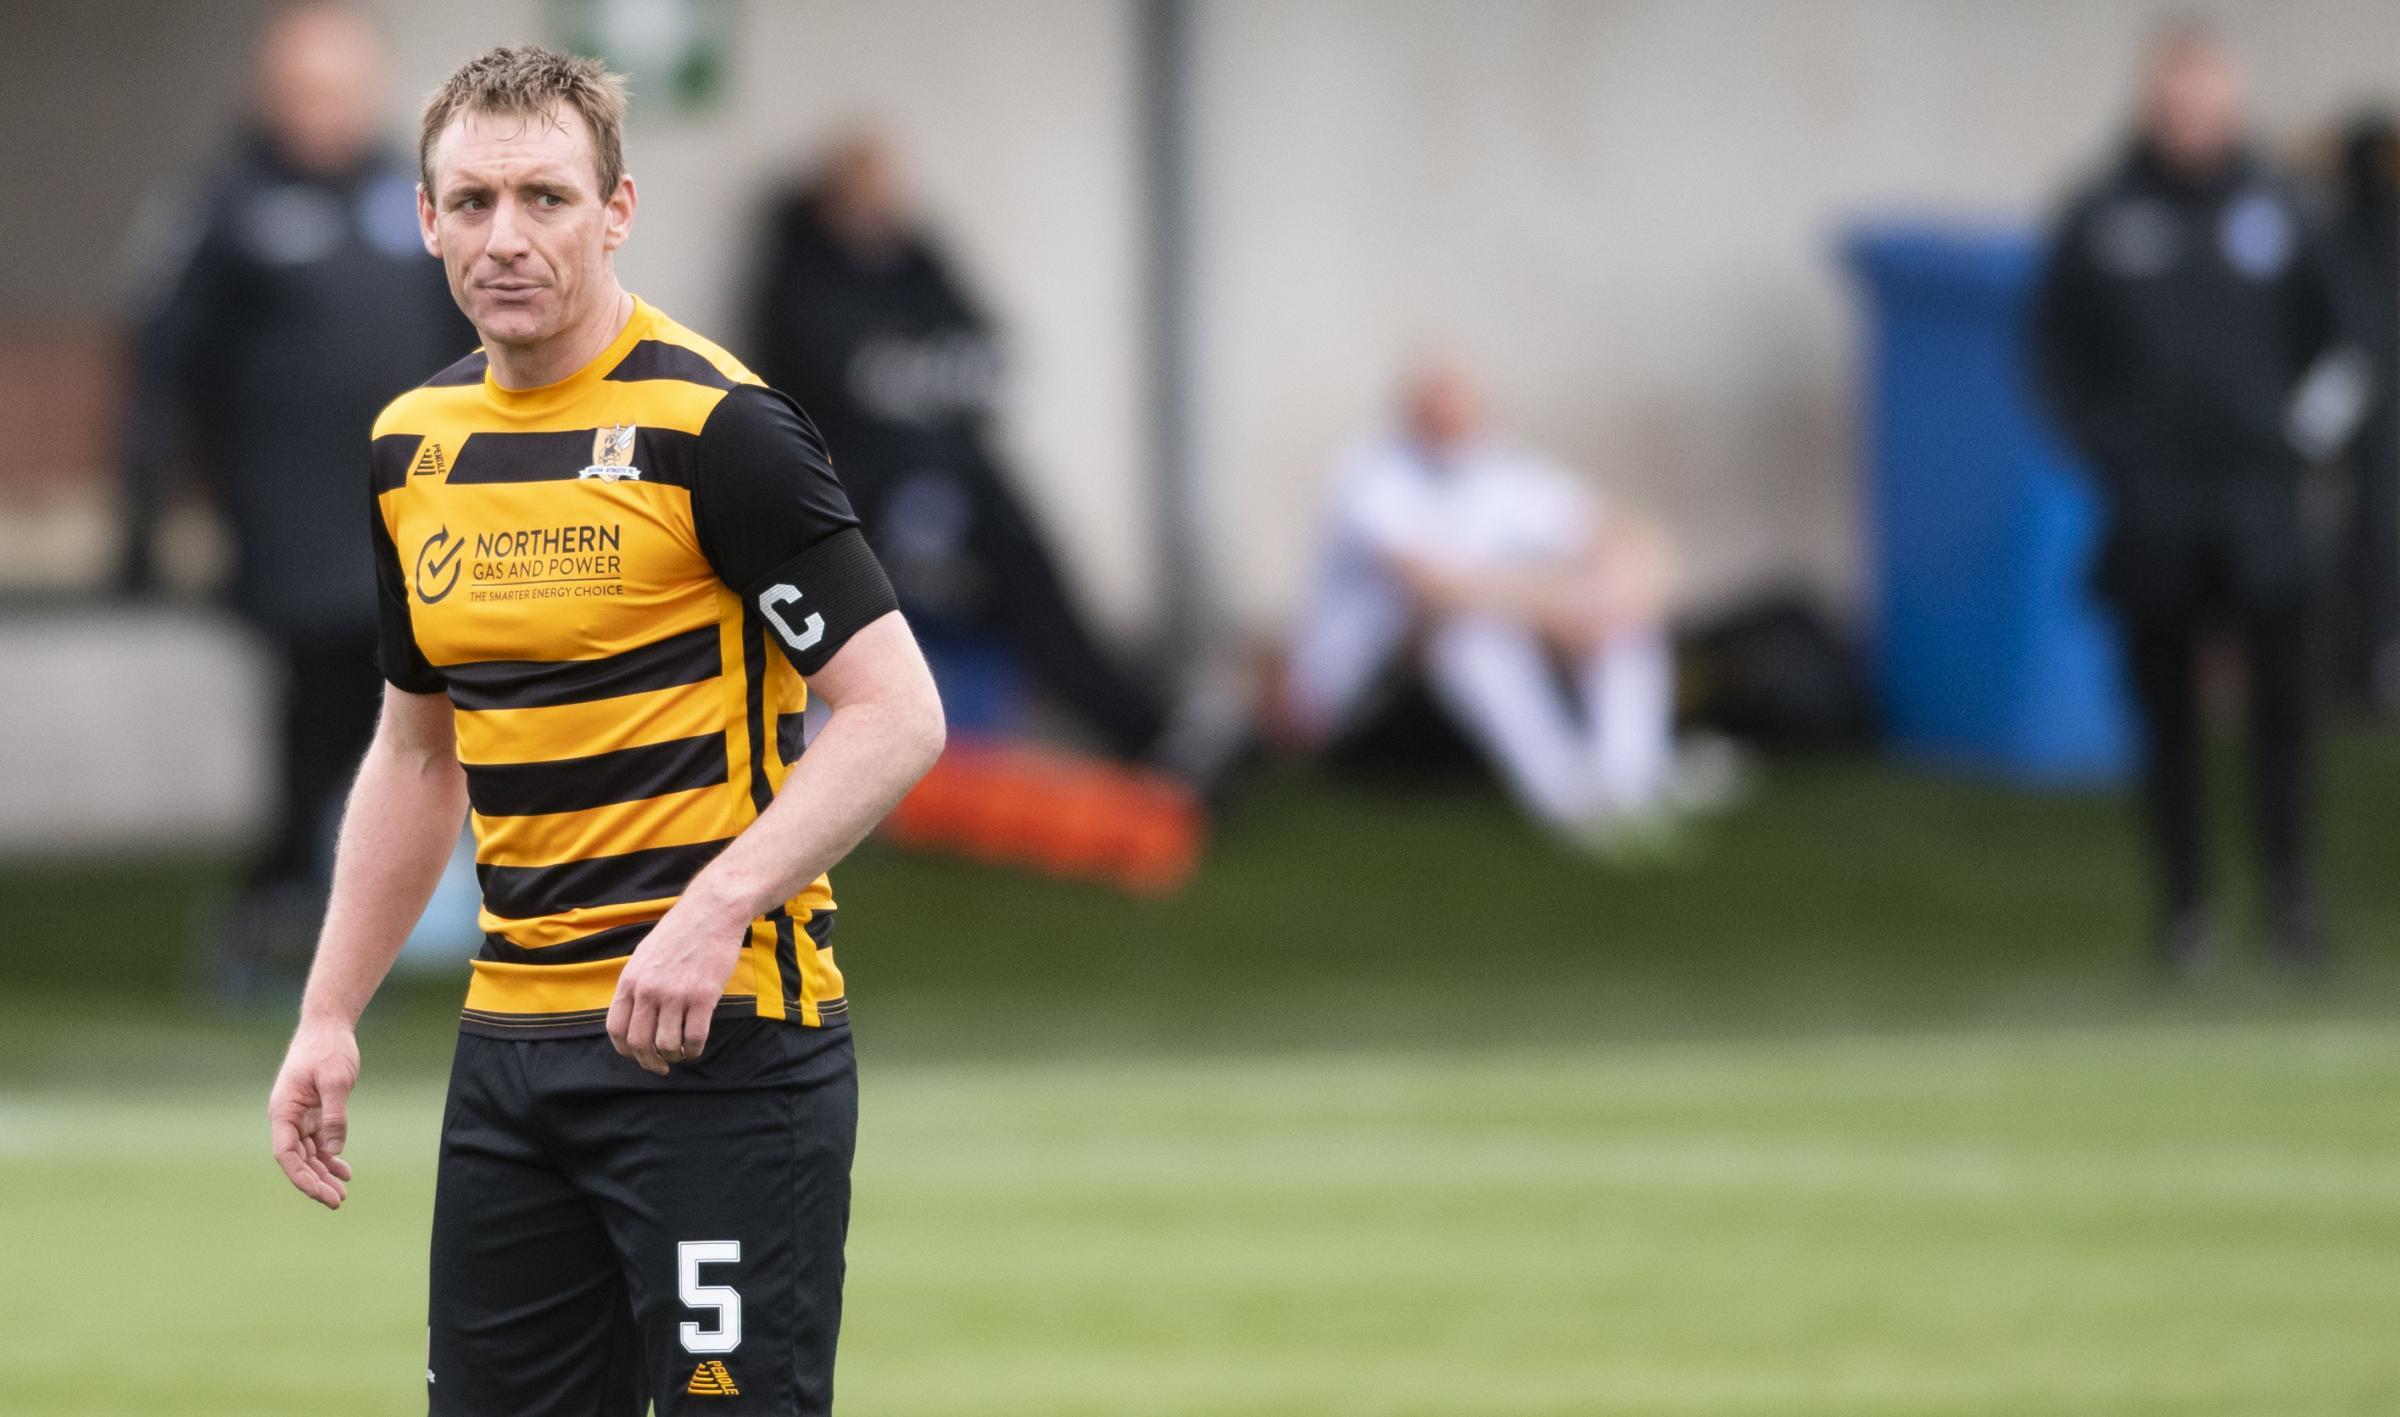 Graham aims to captain Alloa back to the Championship